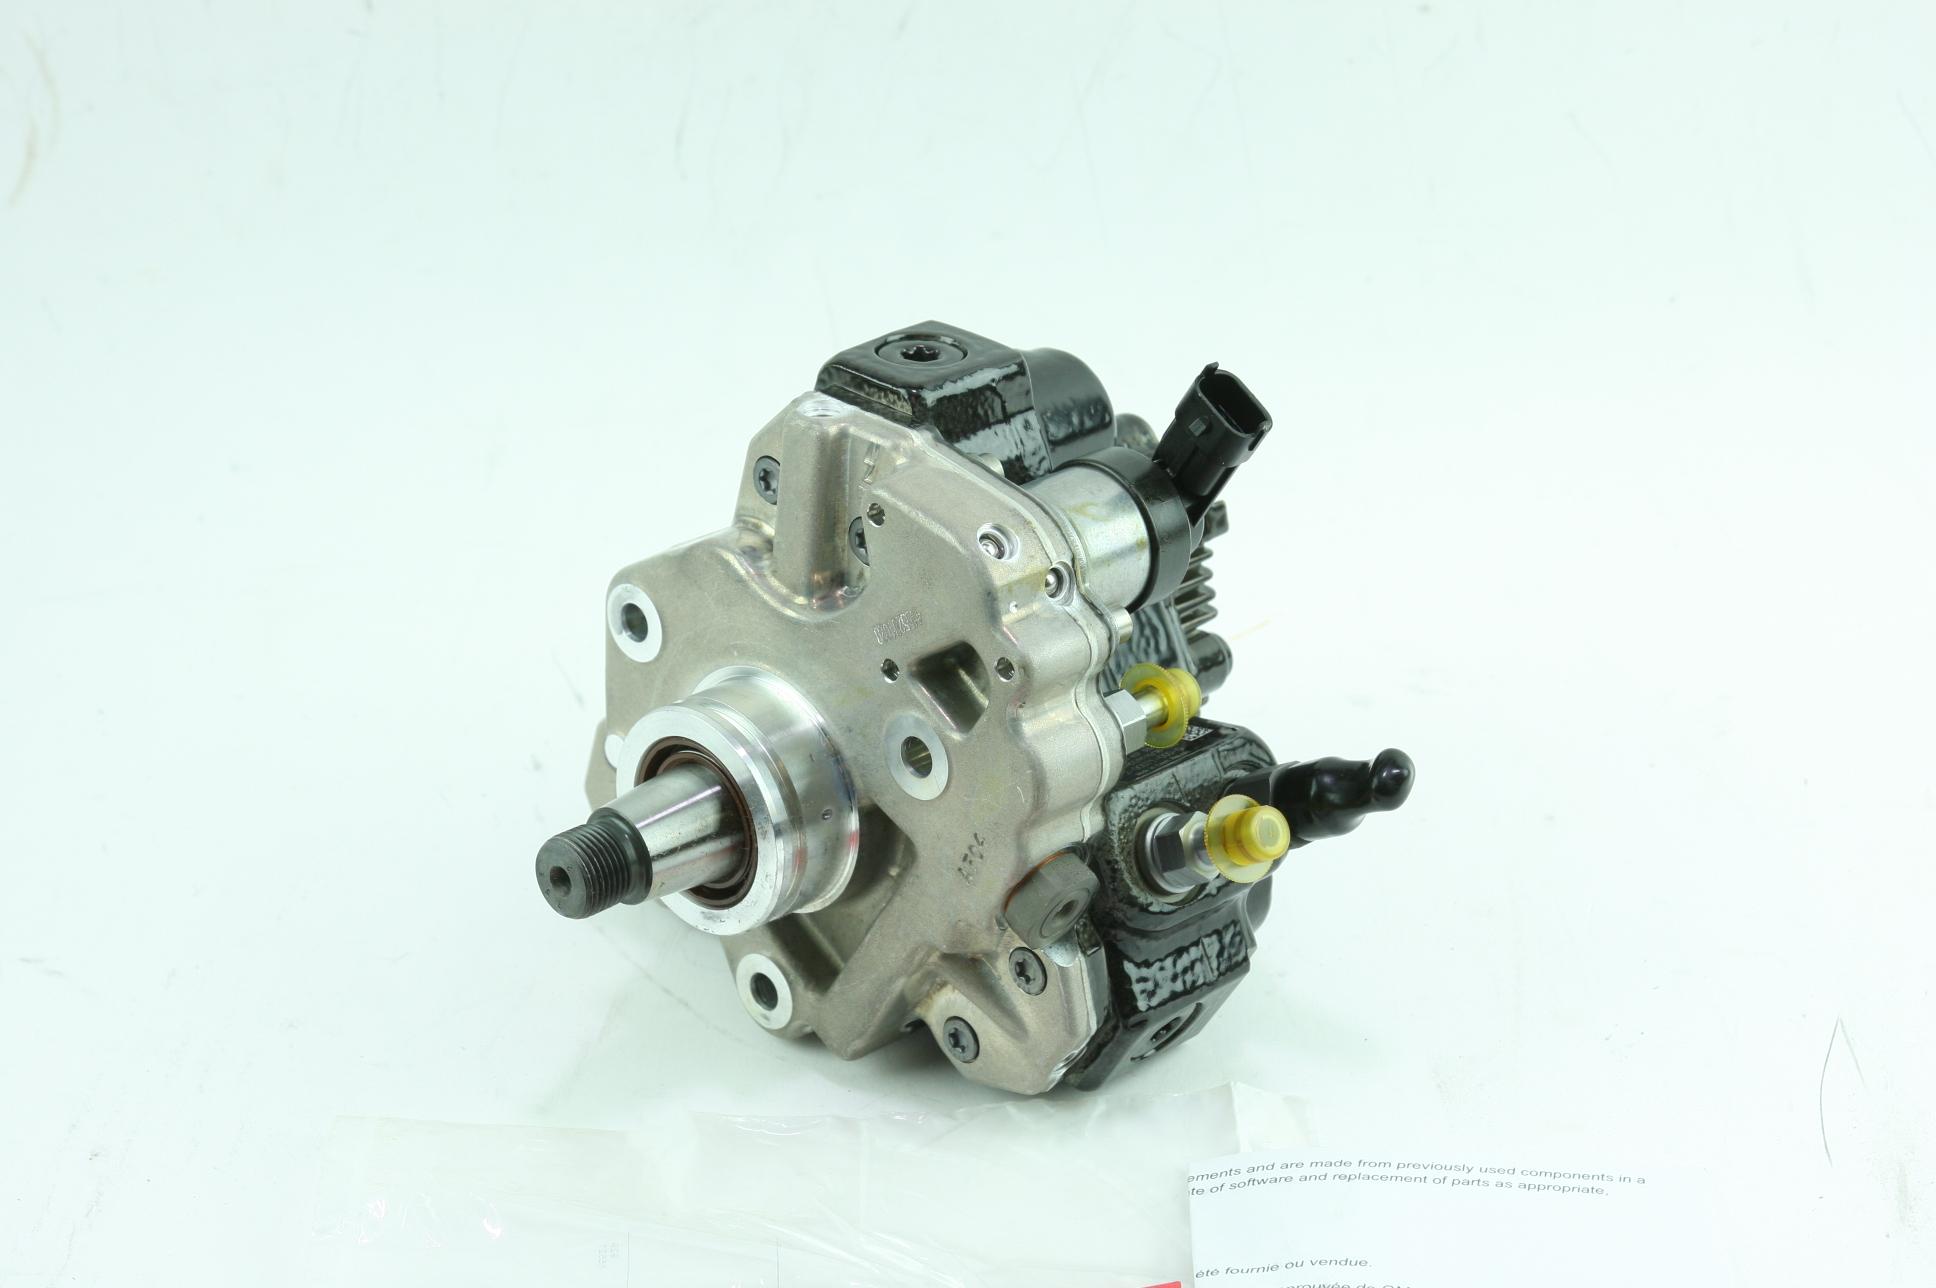 New Genuine OEM GM 97780161 Reman Injection Pump w/ Regulator 06-10 Duramax 6.6 - image 1